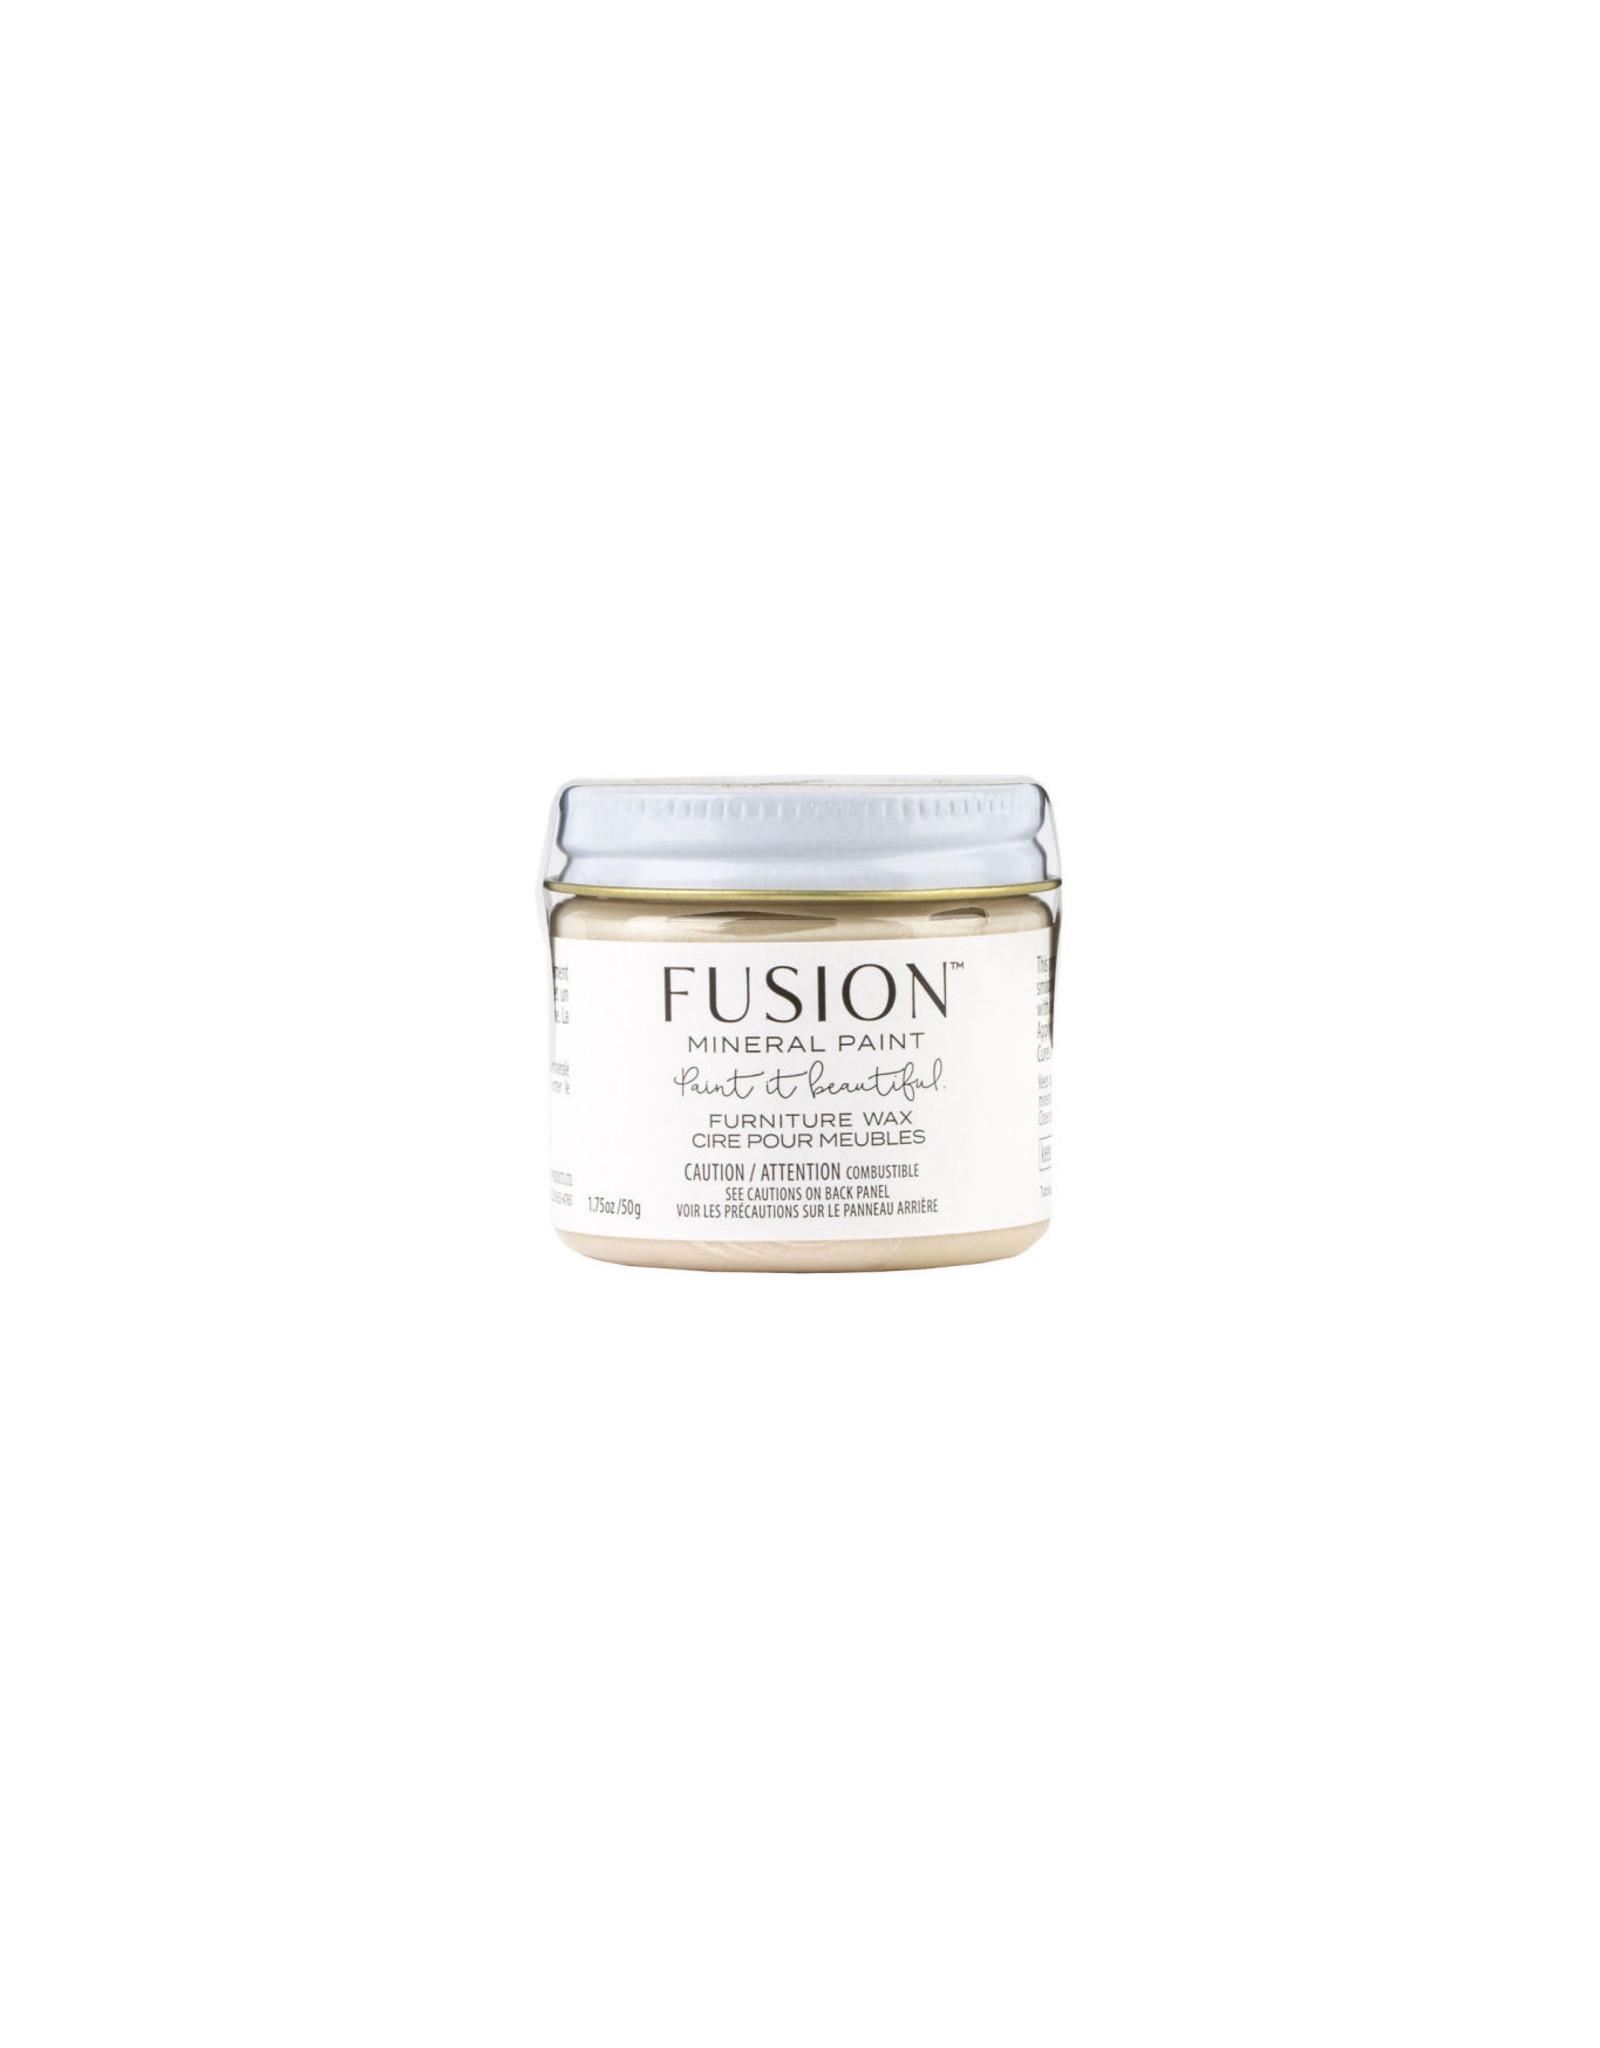 Fusion Mineral Paint Furniture Wax 50g - Pearl